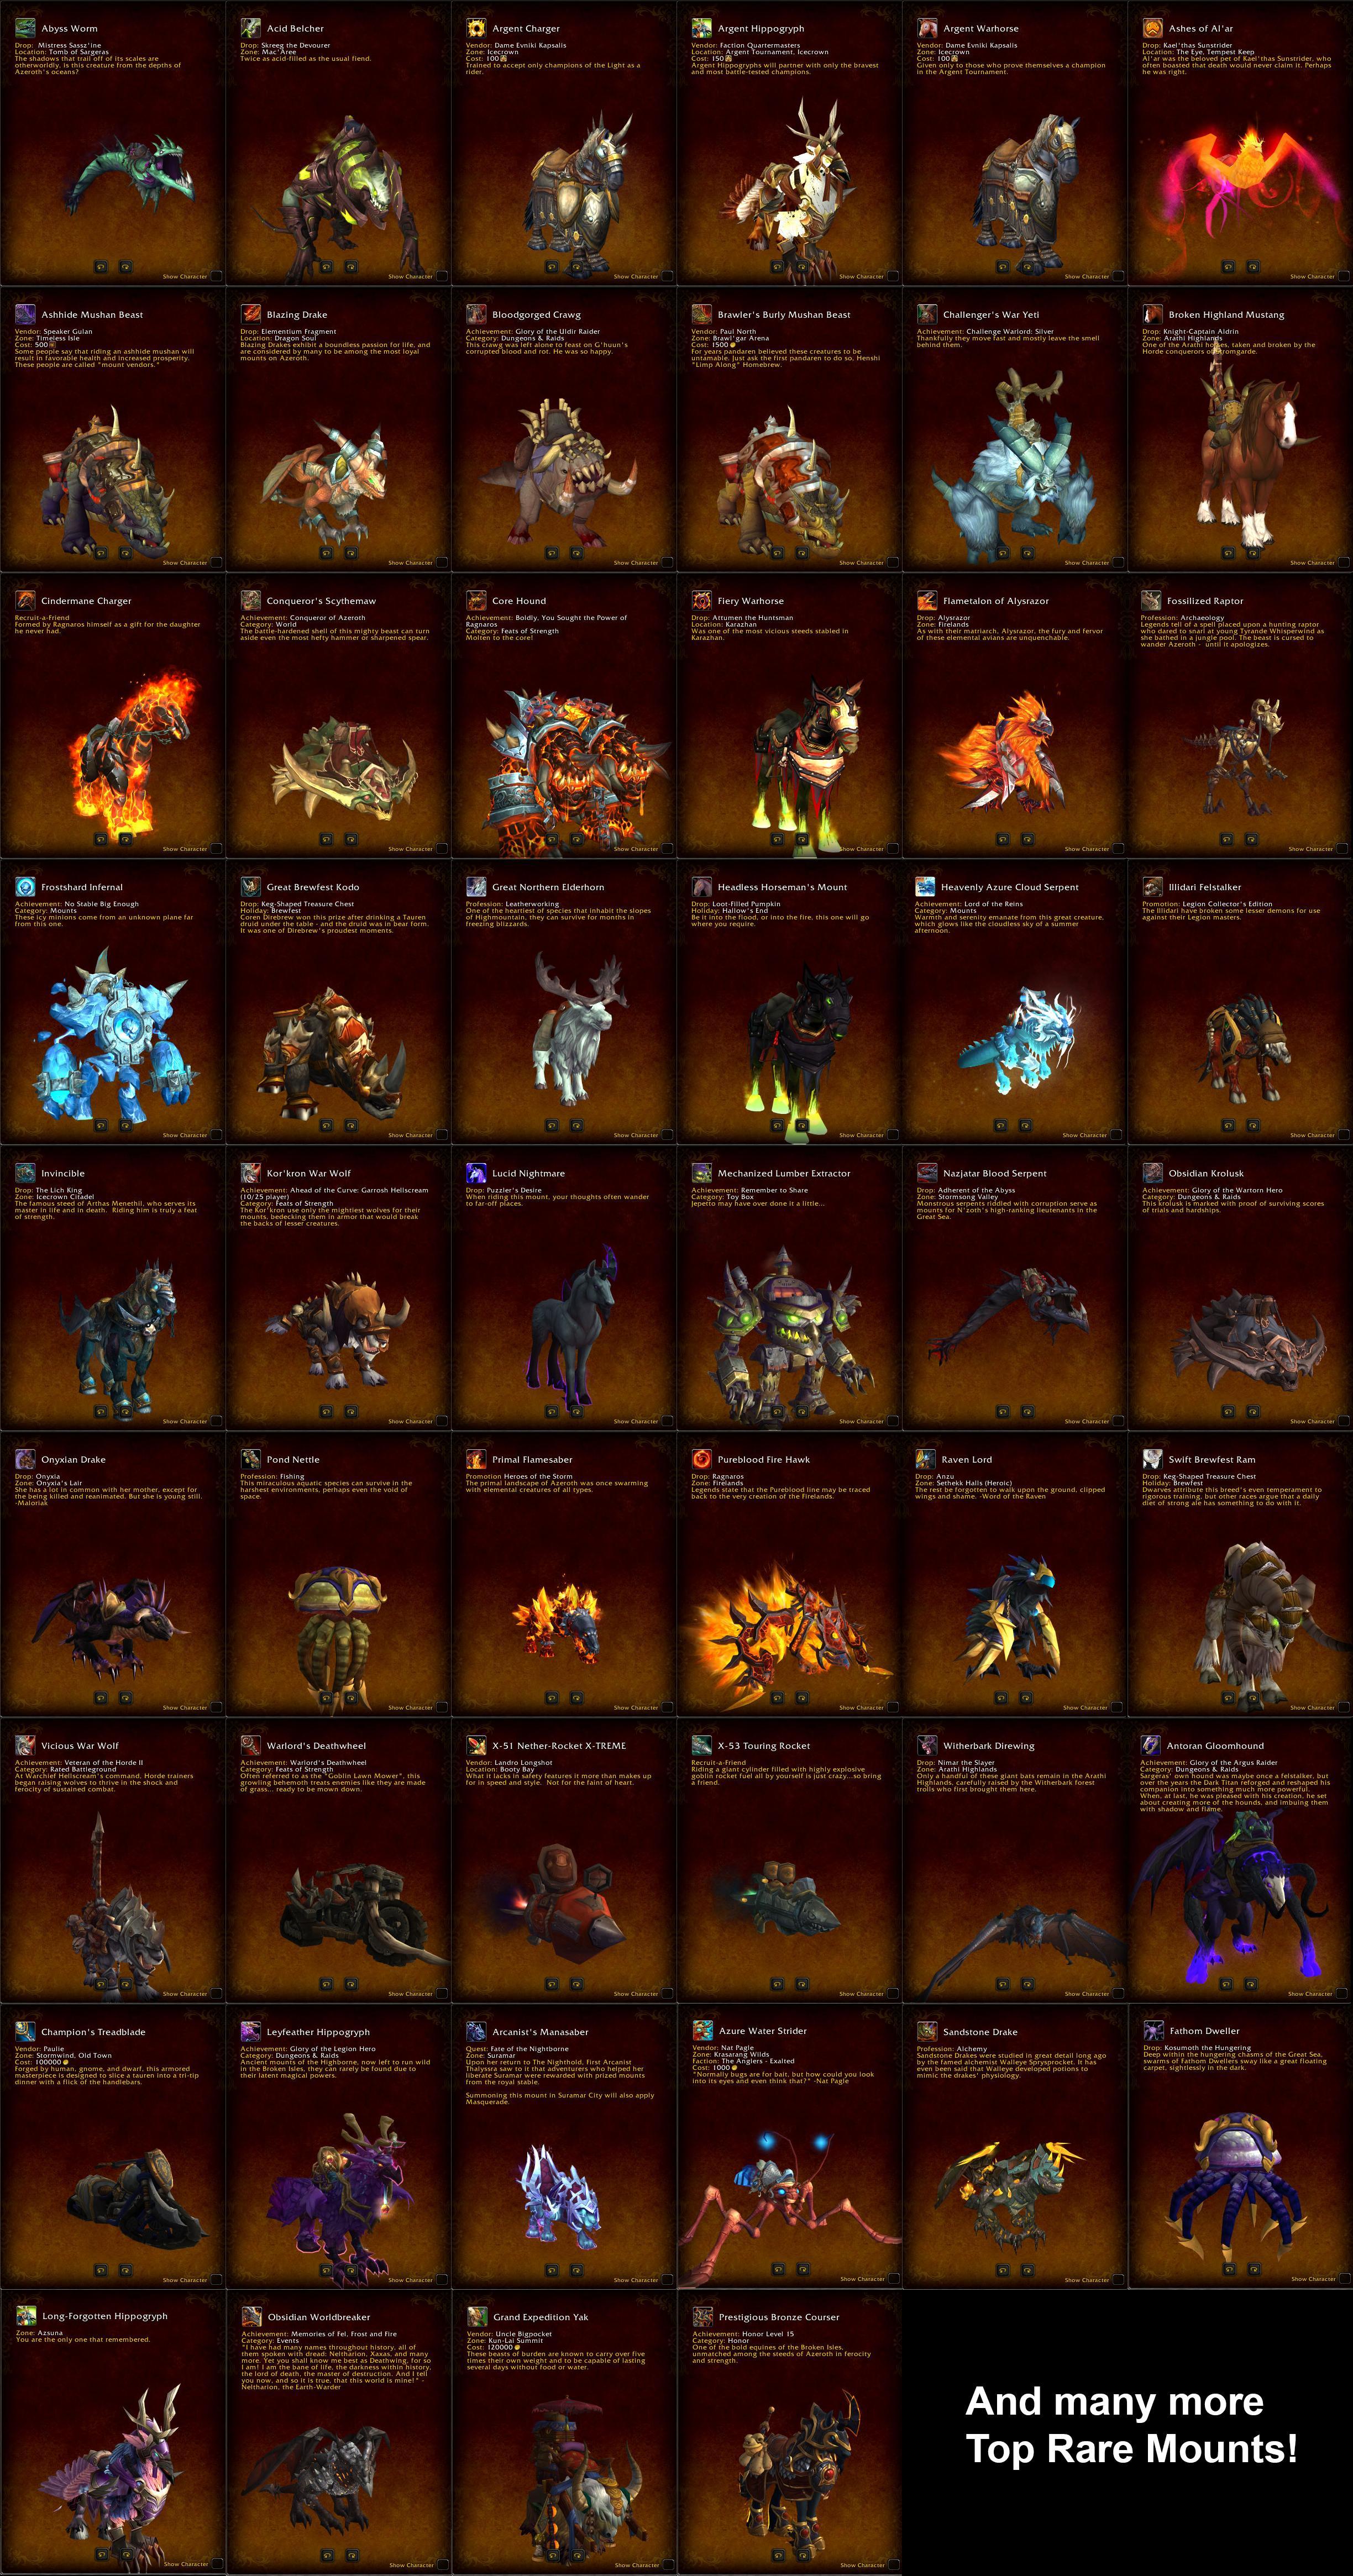 Dungeons That Drop Mounts : dungeons, mounts, Selling, 1x60&17x50,, Mounts,, Weap,, Legs,, Unobtainables,, Epic., EpicNPC, Marketplace